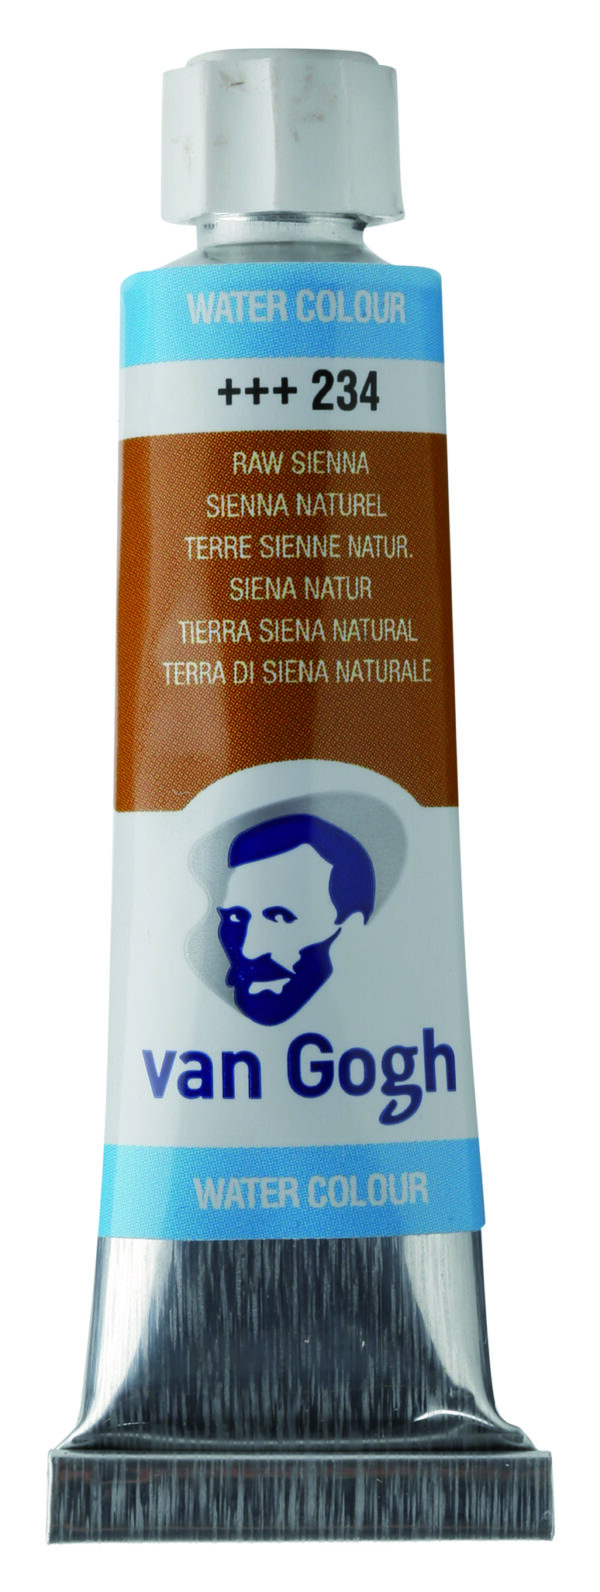 Van Gogh 234 Raw sienna - 10 ml